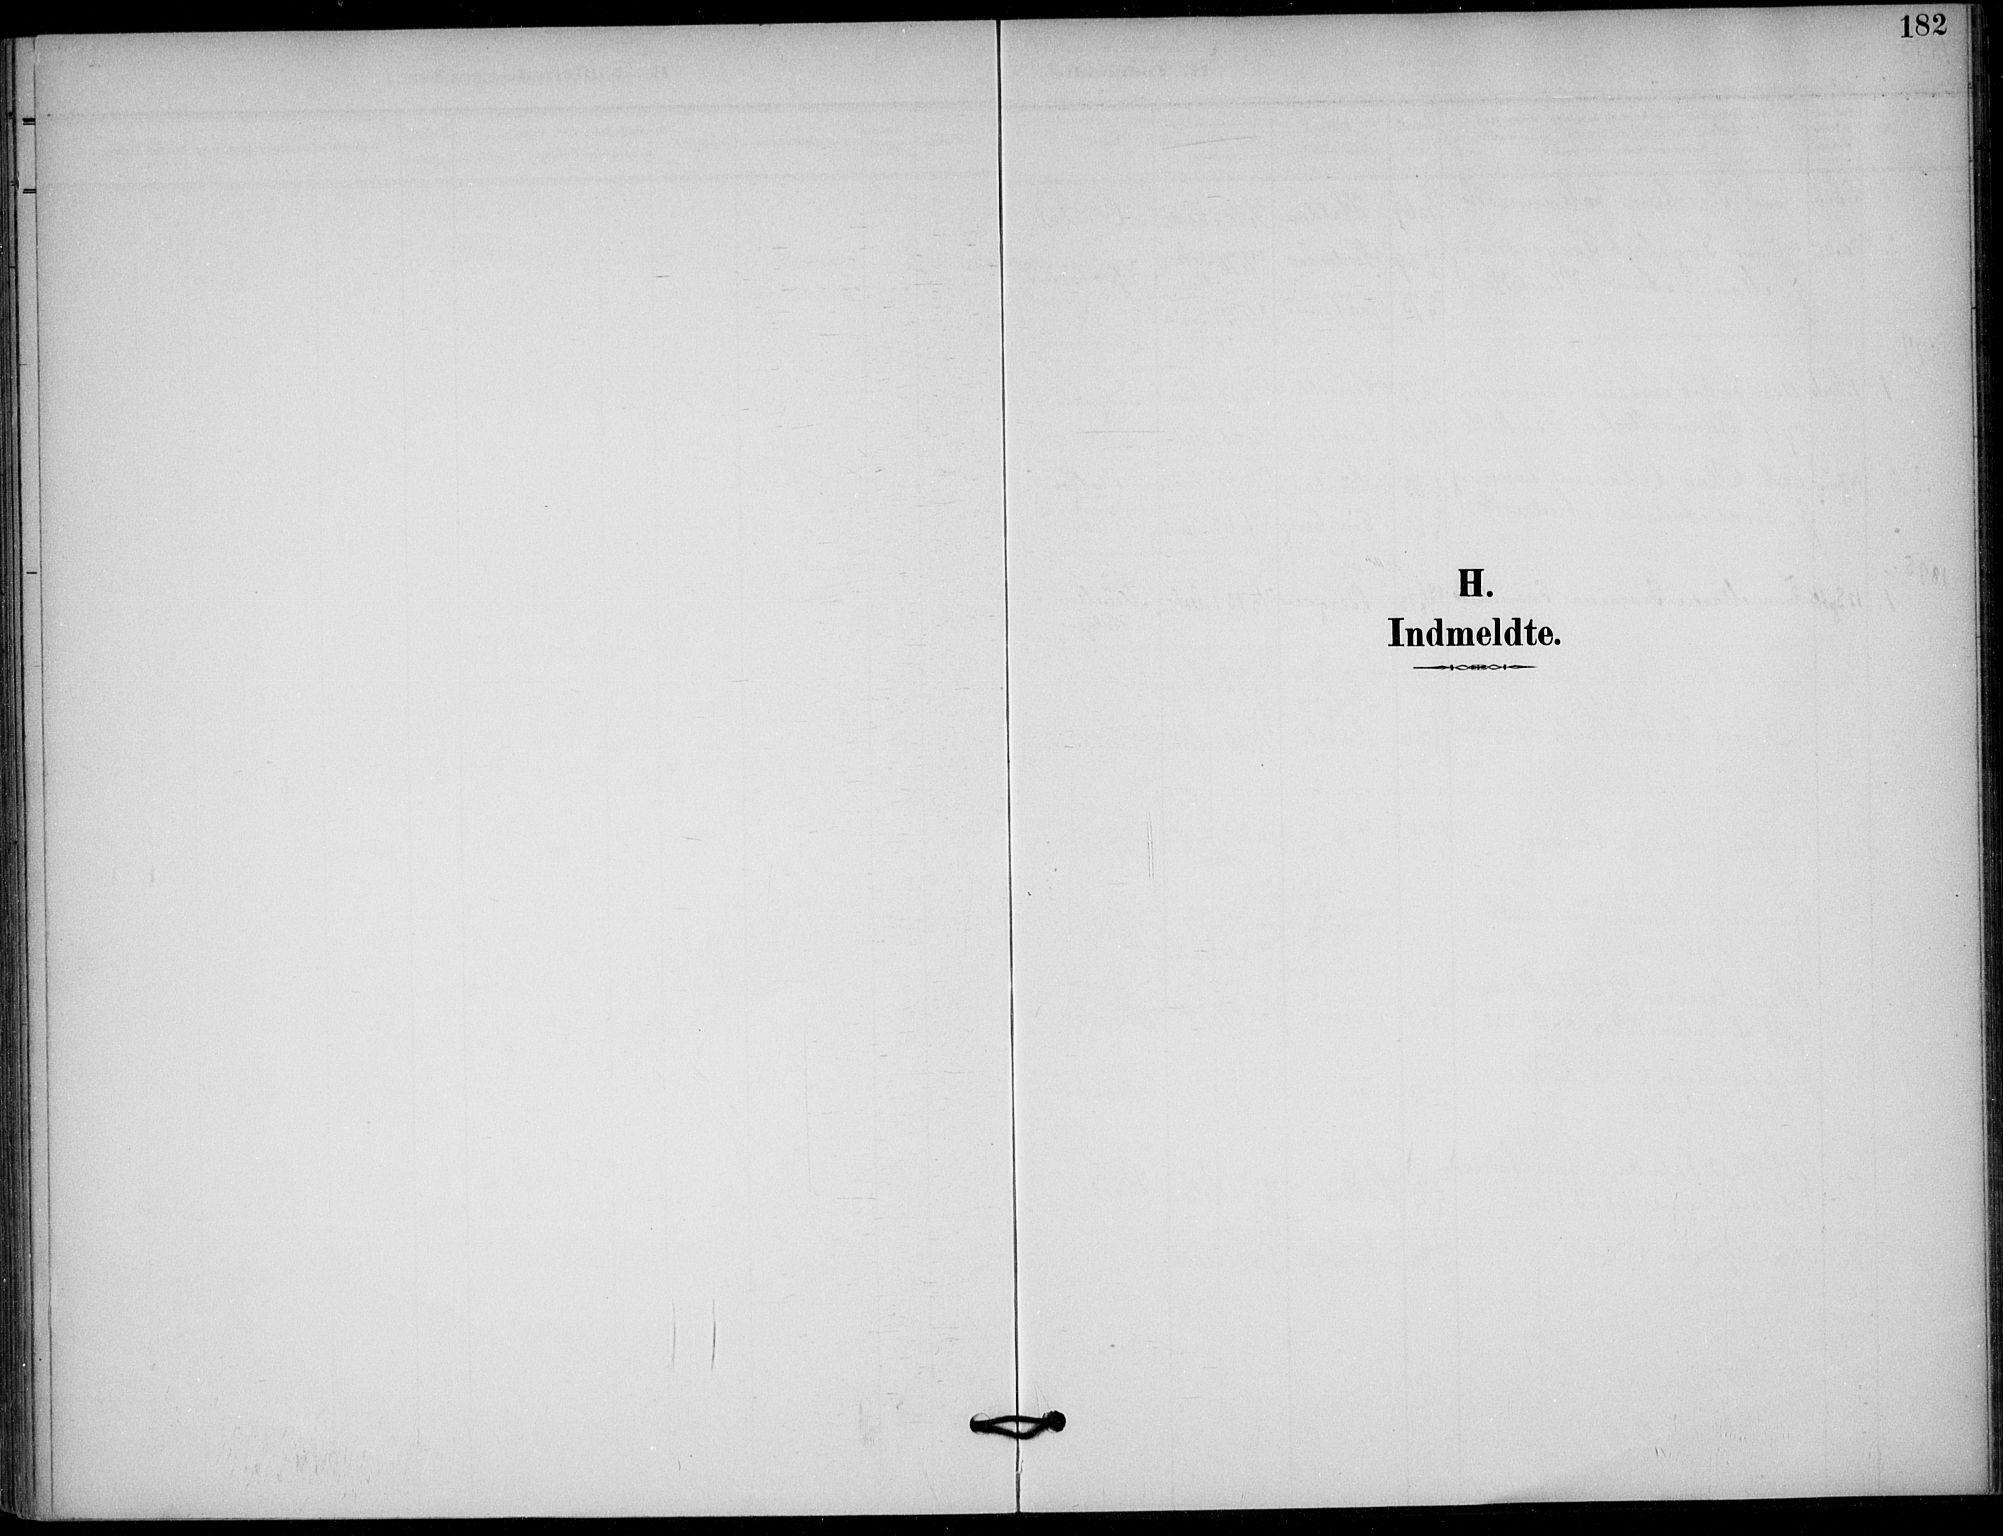 SAKO, Solum kirkebøker, F/Fb/L0002: Ministerialbok nr. II 2, 1893-1901, s. 182